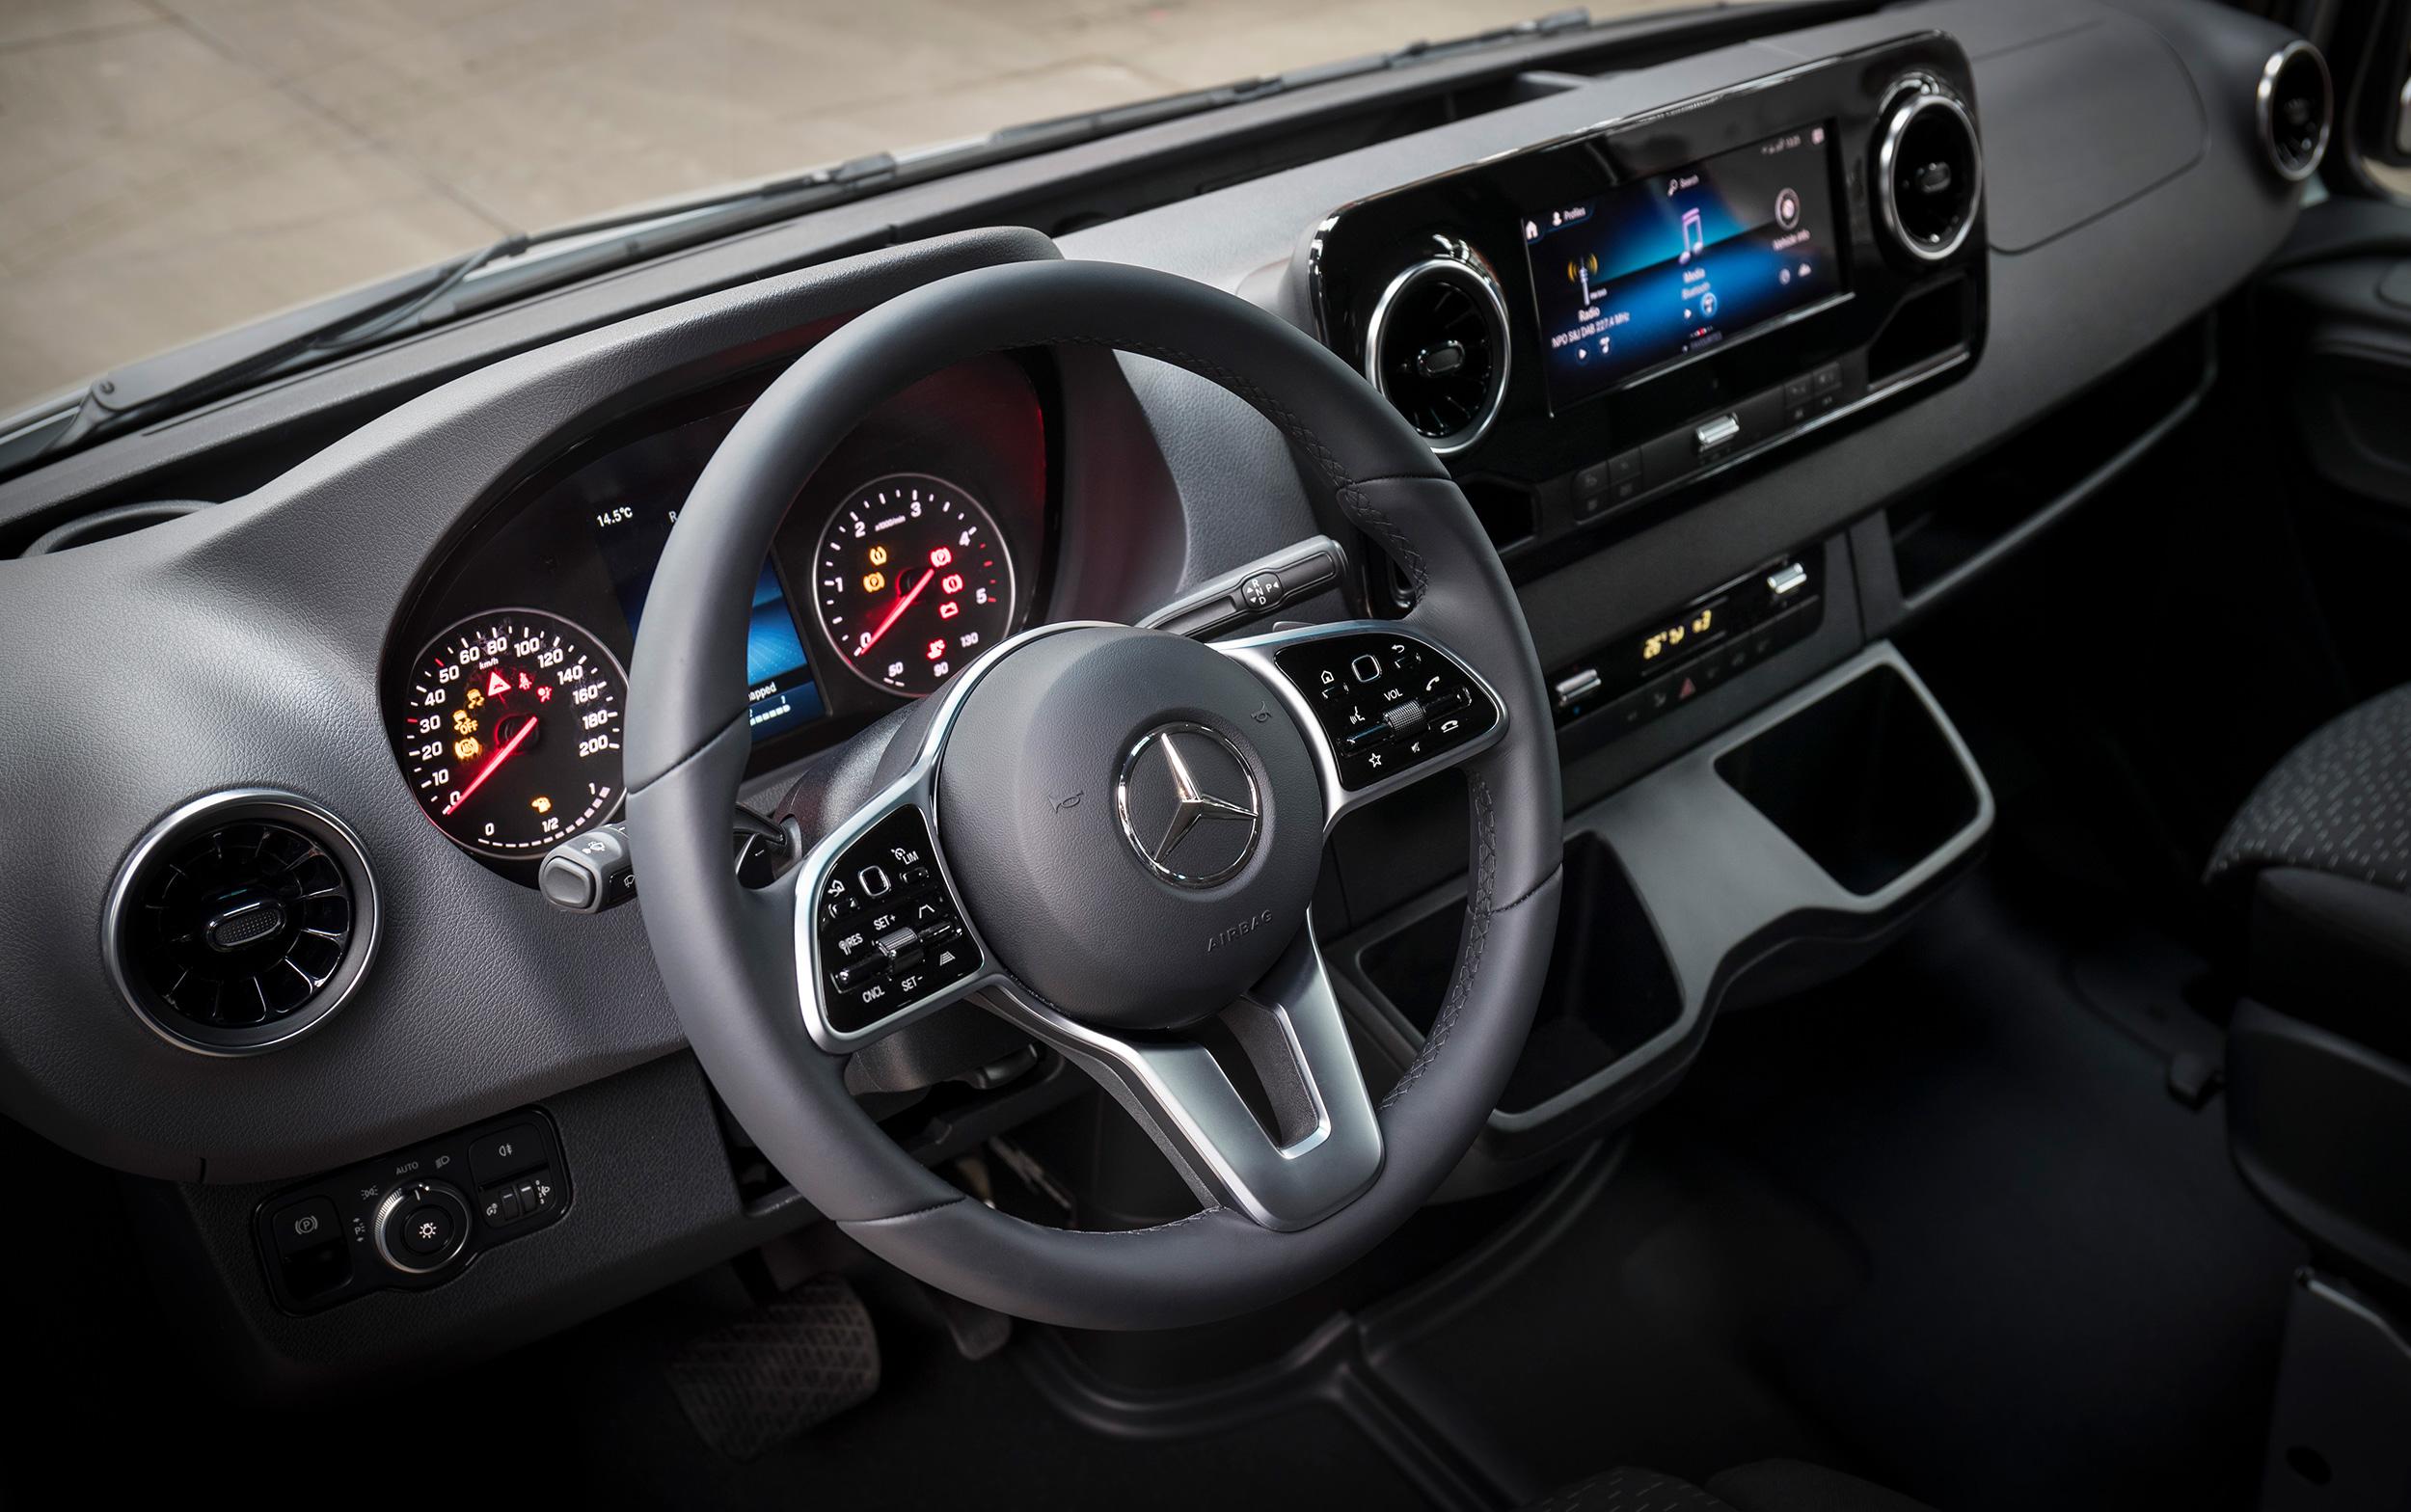 Mercedes Van Cockpit